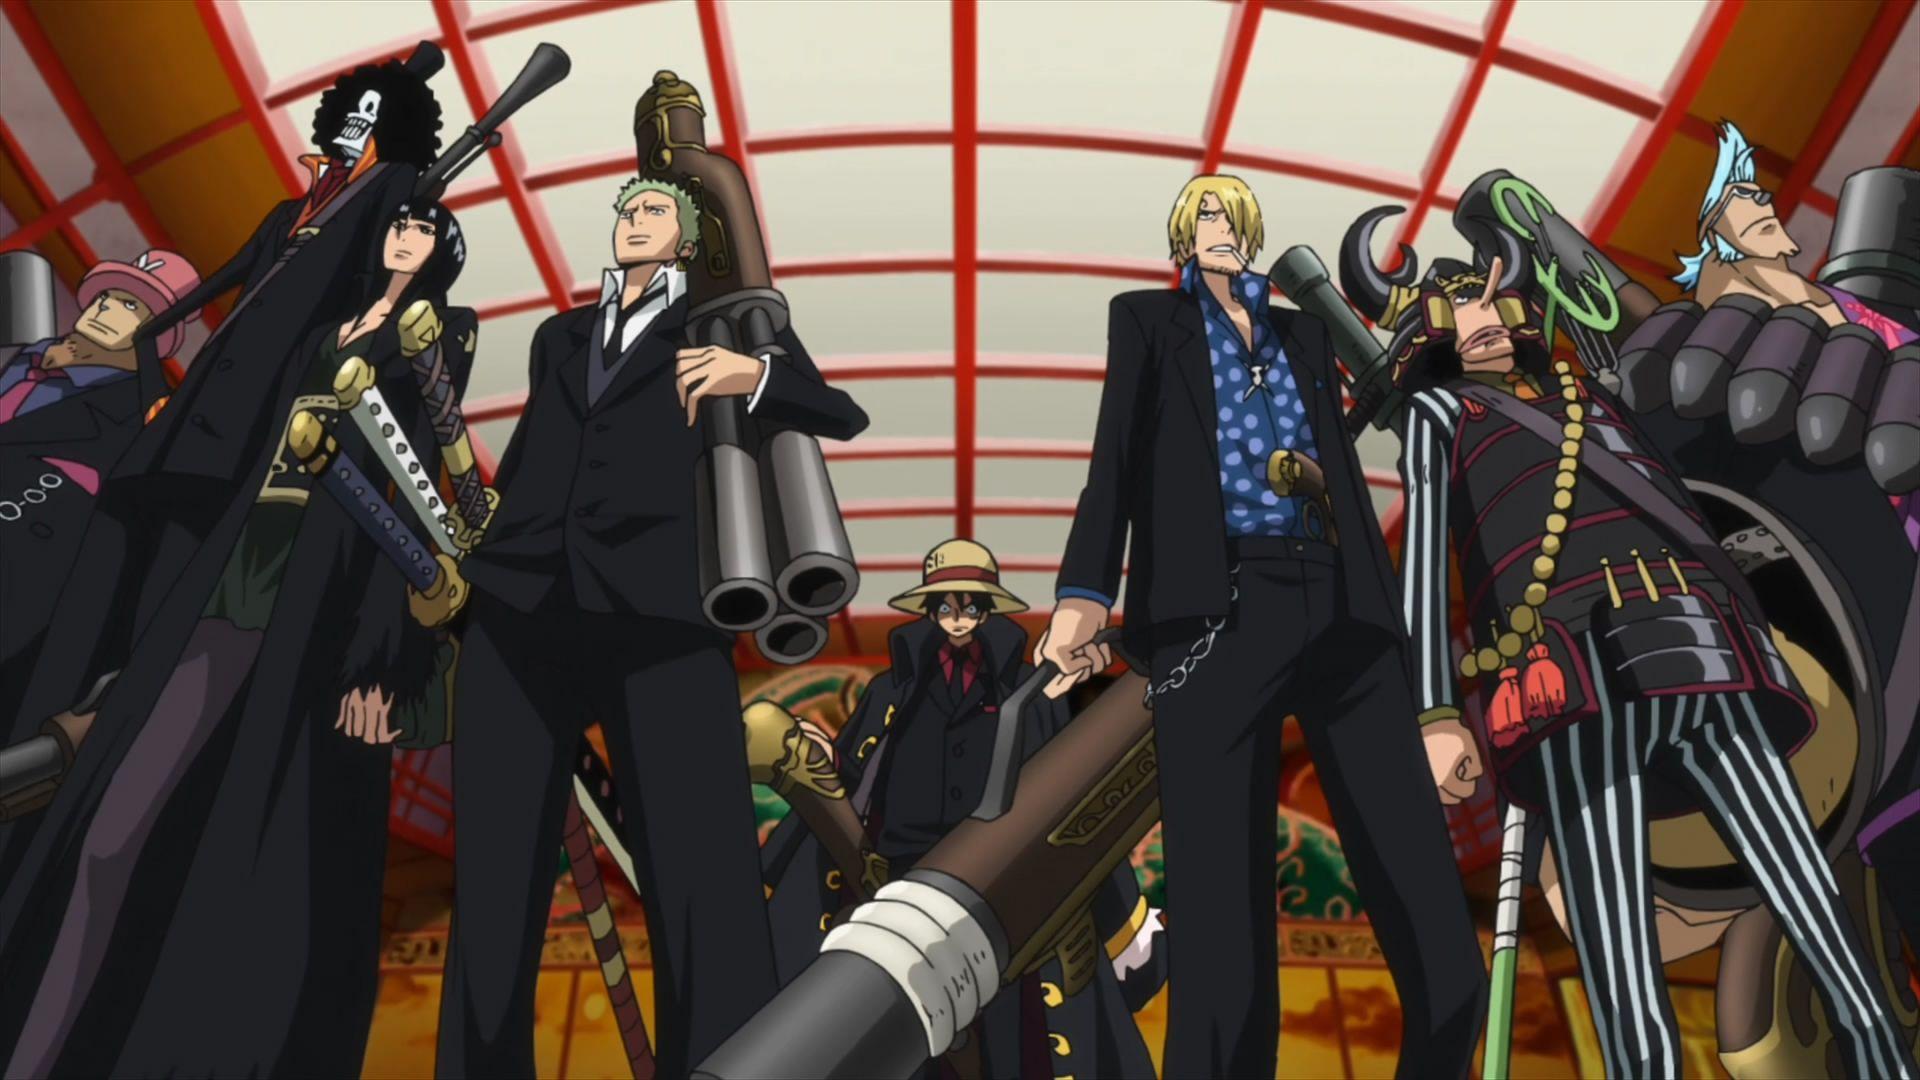 pinkiril dimanov on anime | pinterest